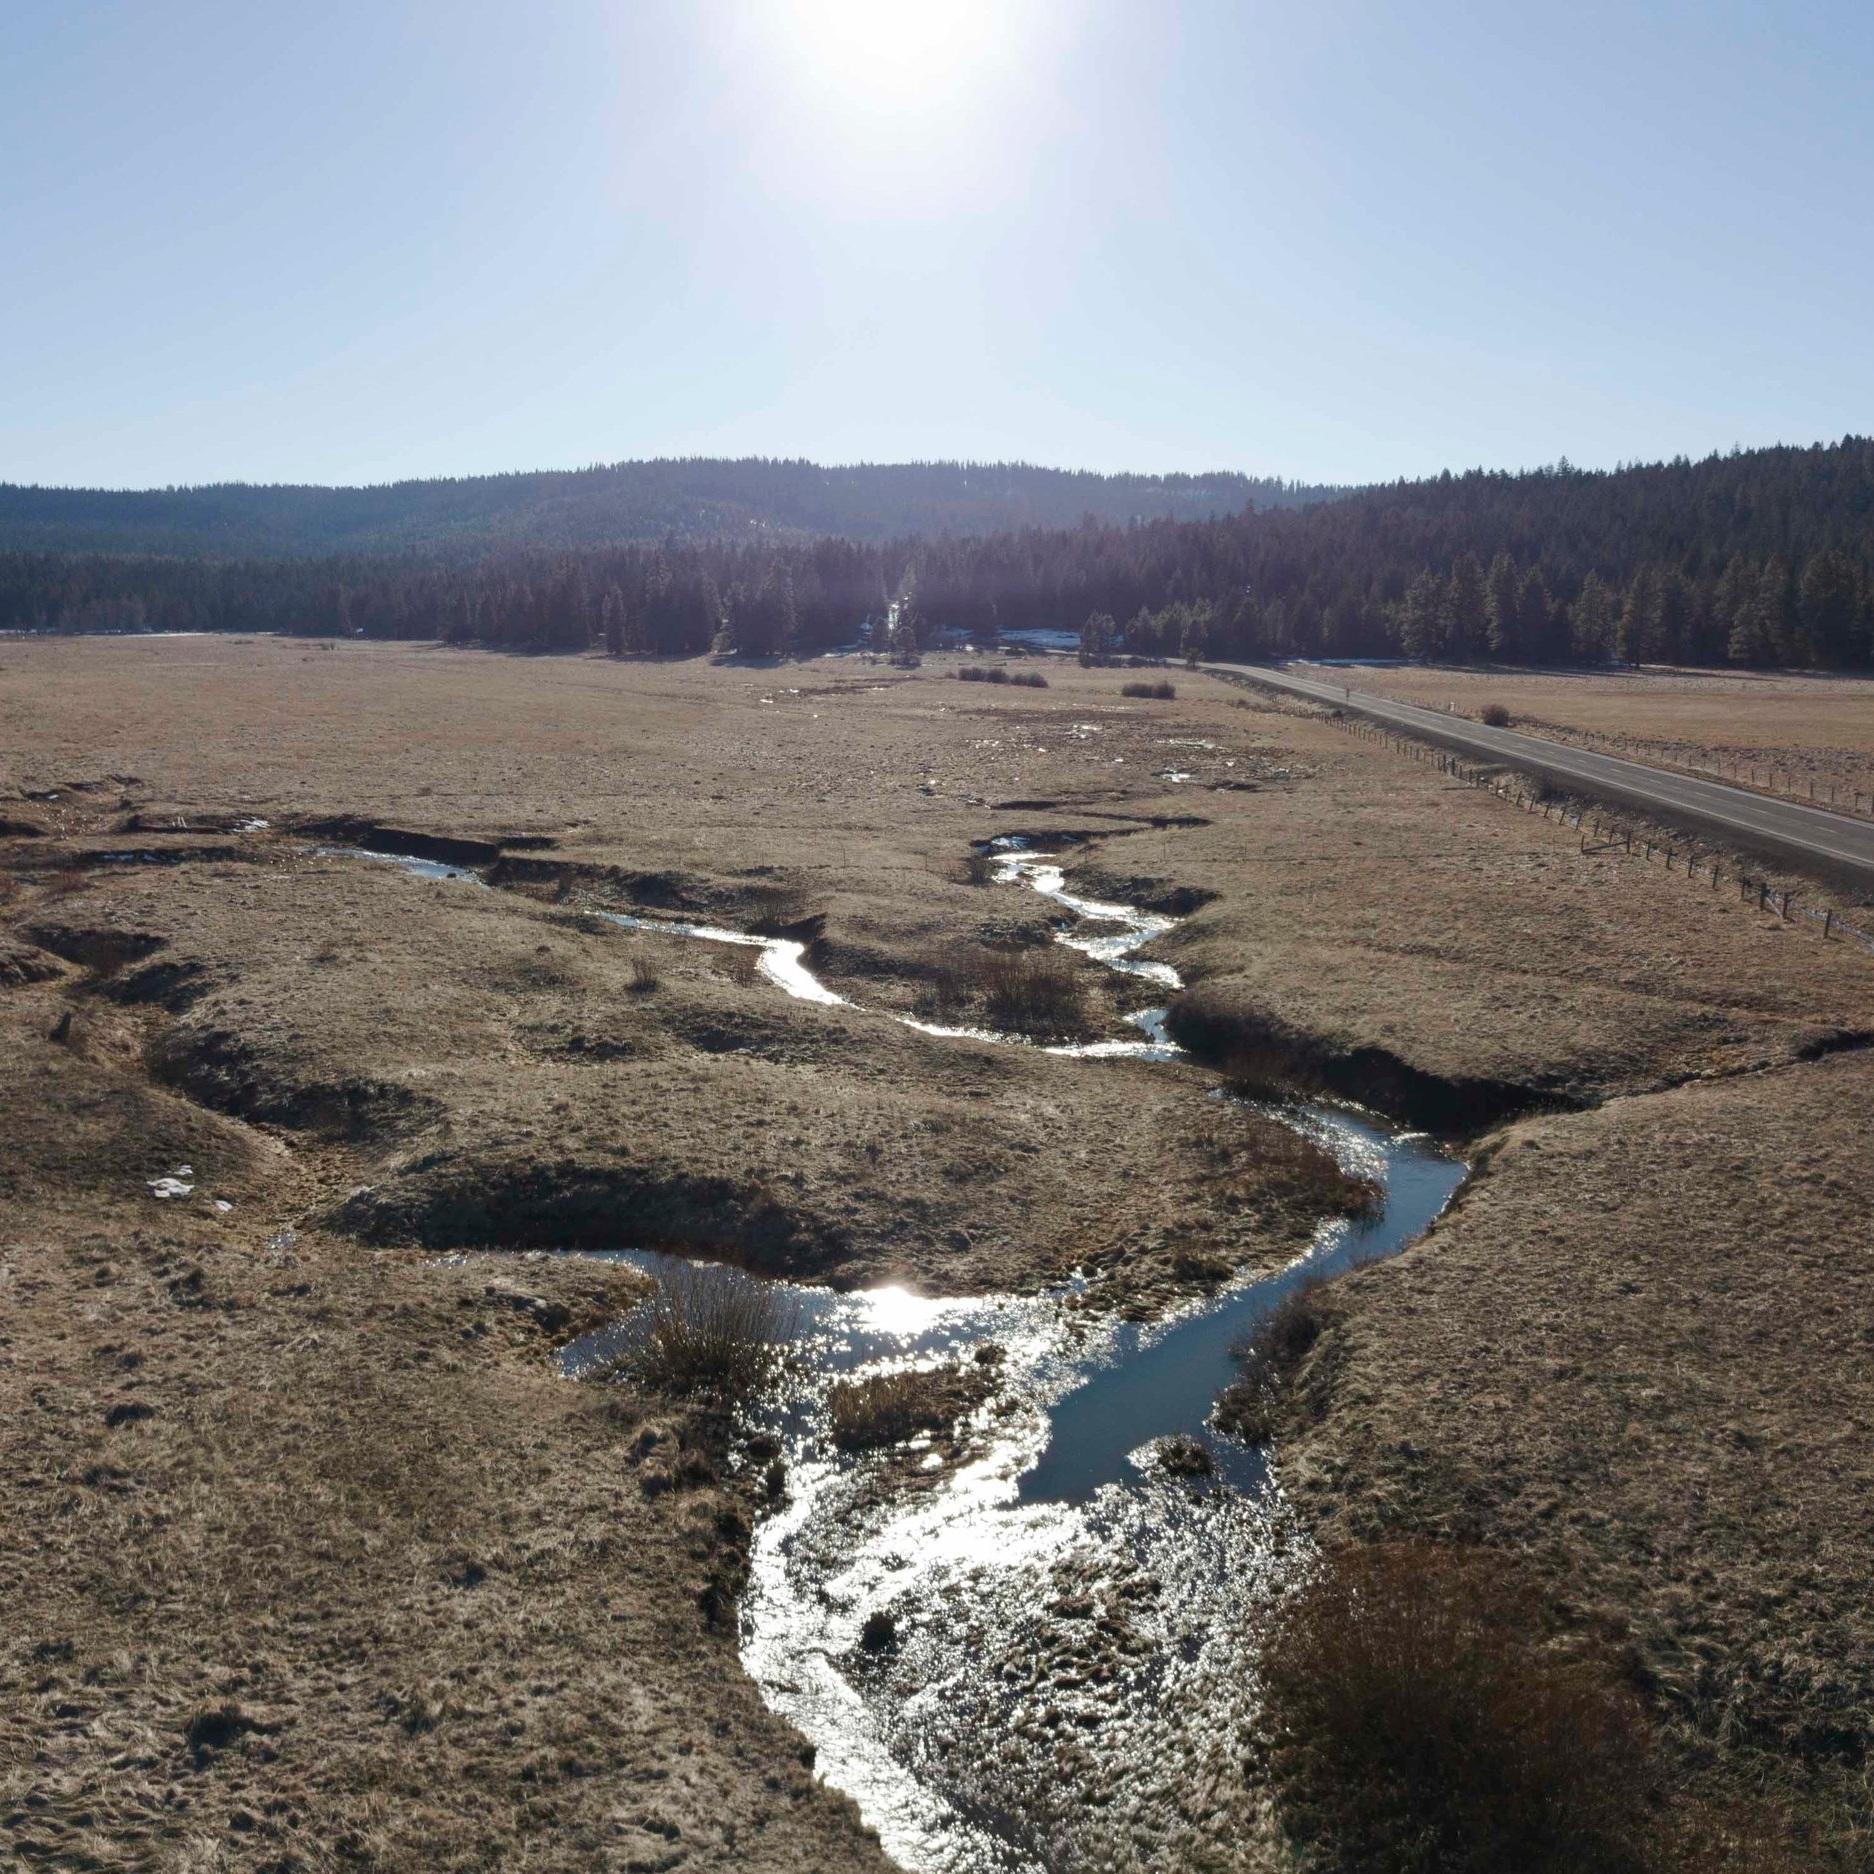 Dead-Indian-Creek-Memorial-Road-drone.jpg